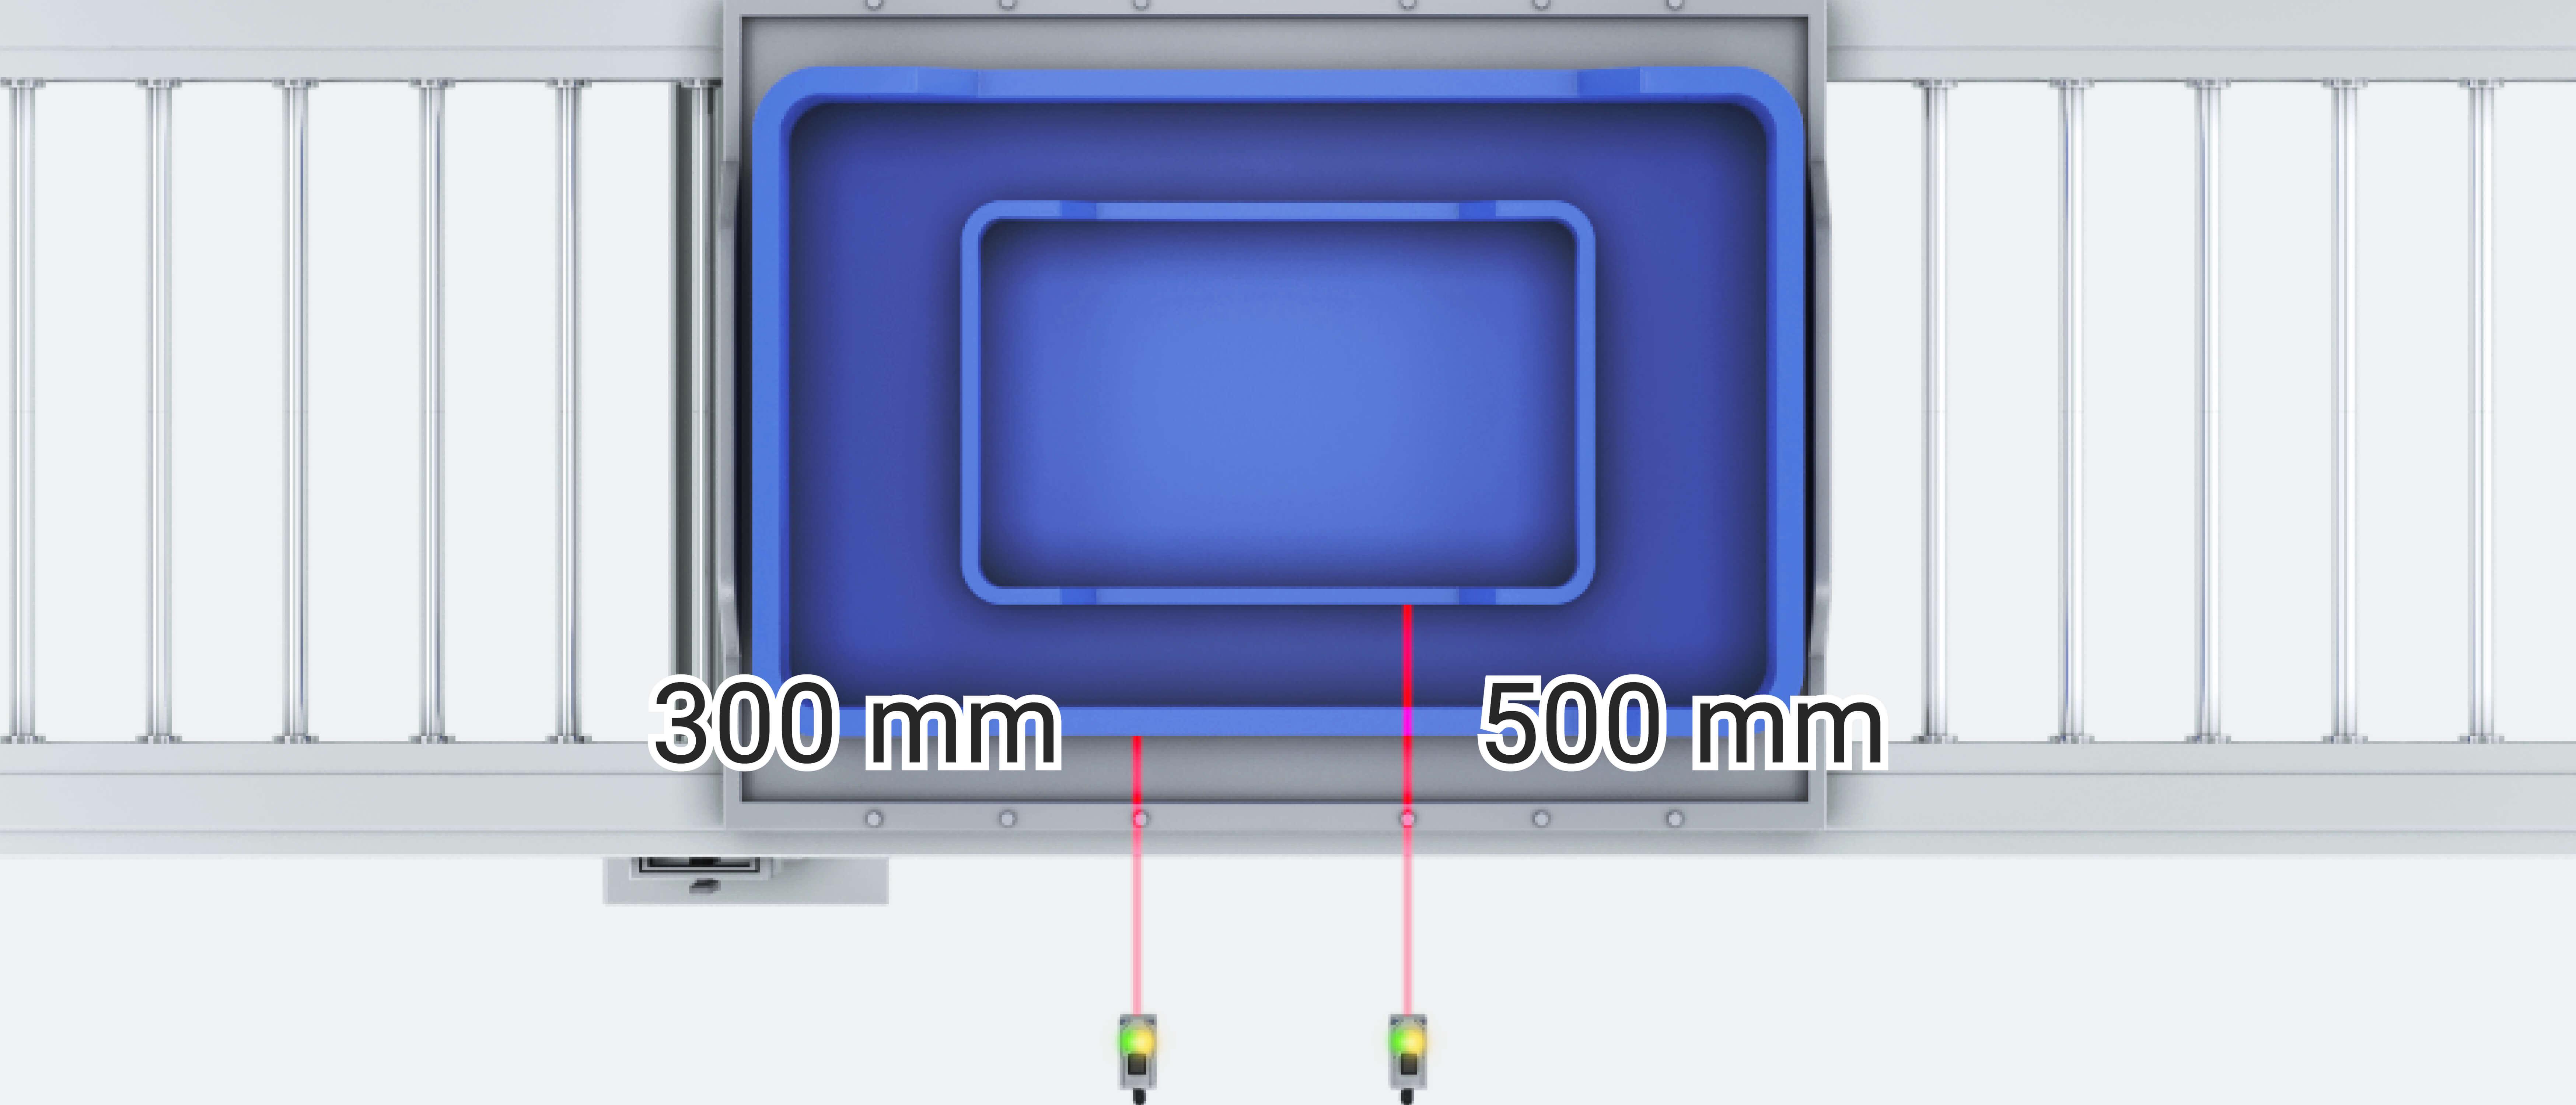 e3as wide sensing range banner sol